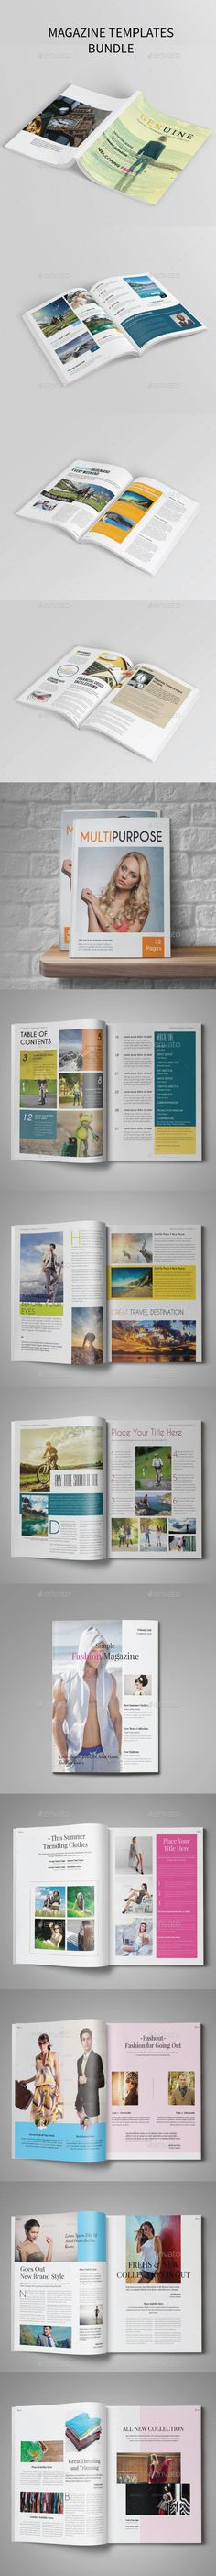 3 in 1 Magazine Templates Bundle  #design Download: http://graphicriver.net/item/3-in-1-magazine-bundle-vol2/13832407?ref=ksioks